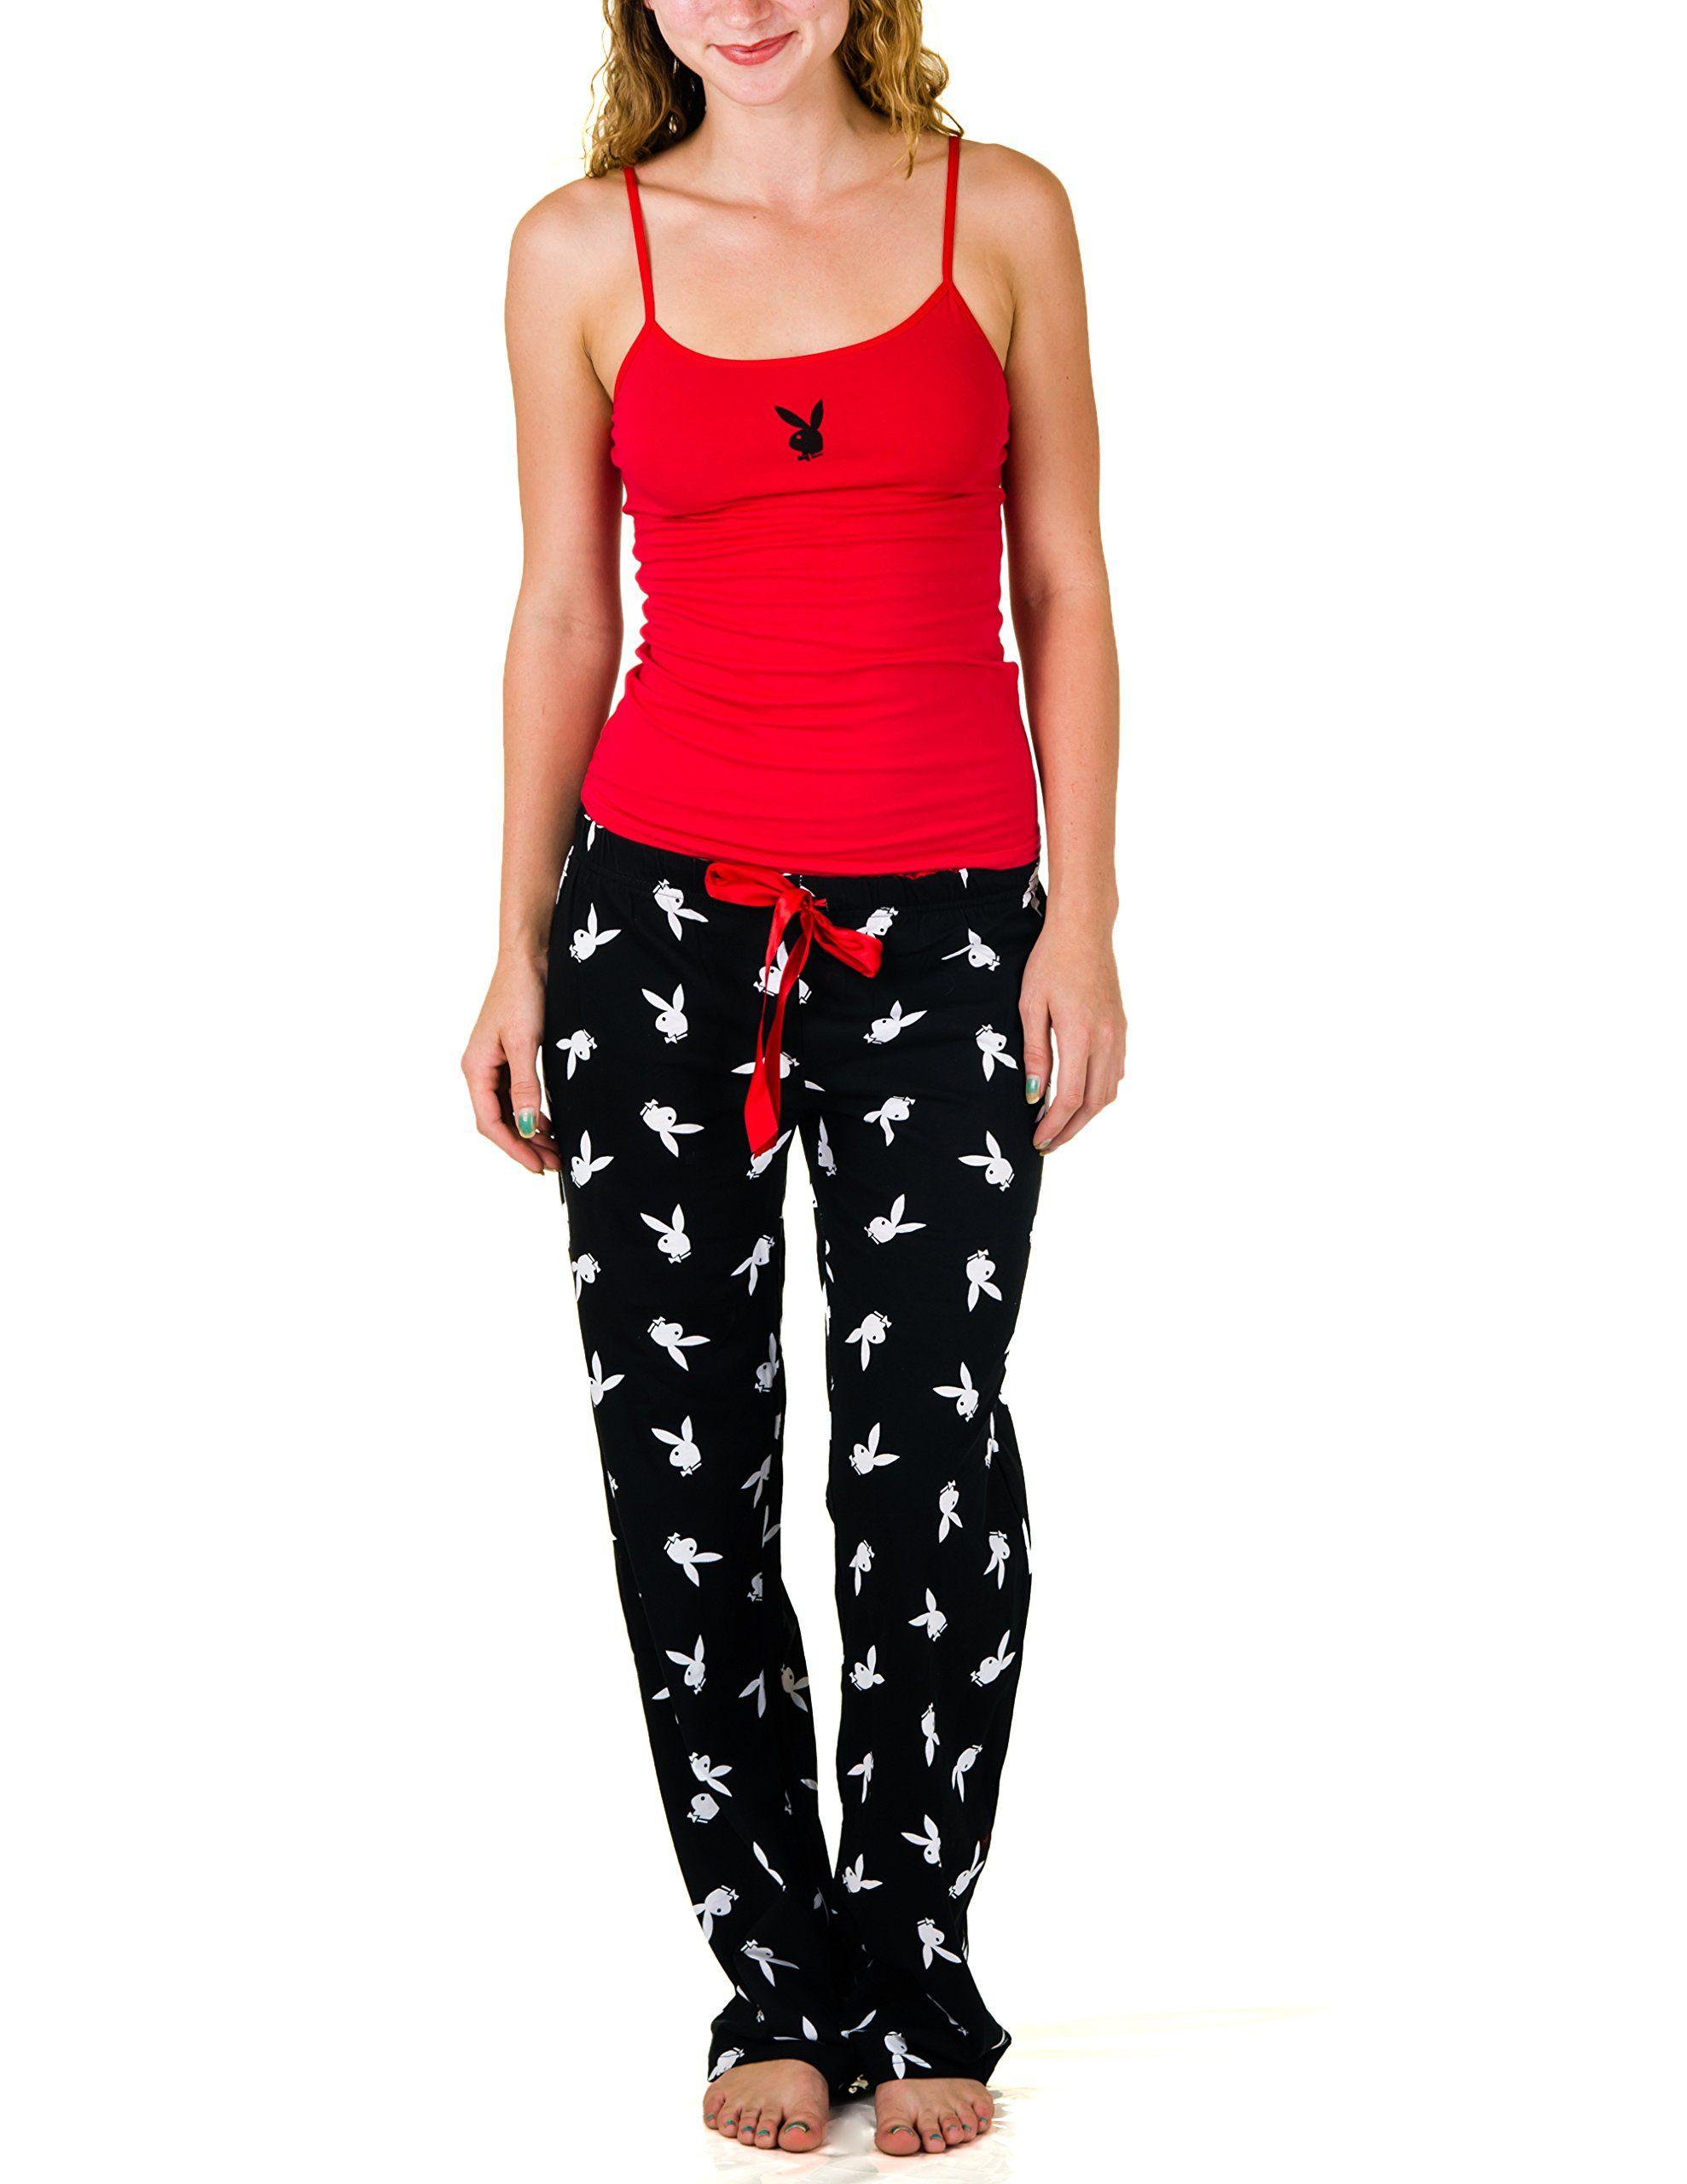 Amazon.com: Playboy Juniors Pajama Set with Cami and Drawstring ...